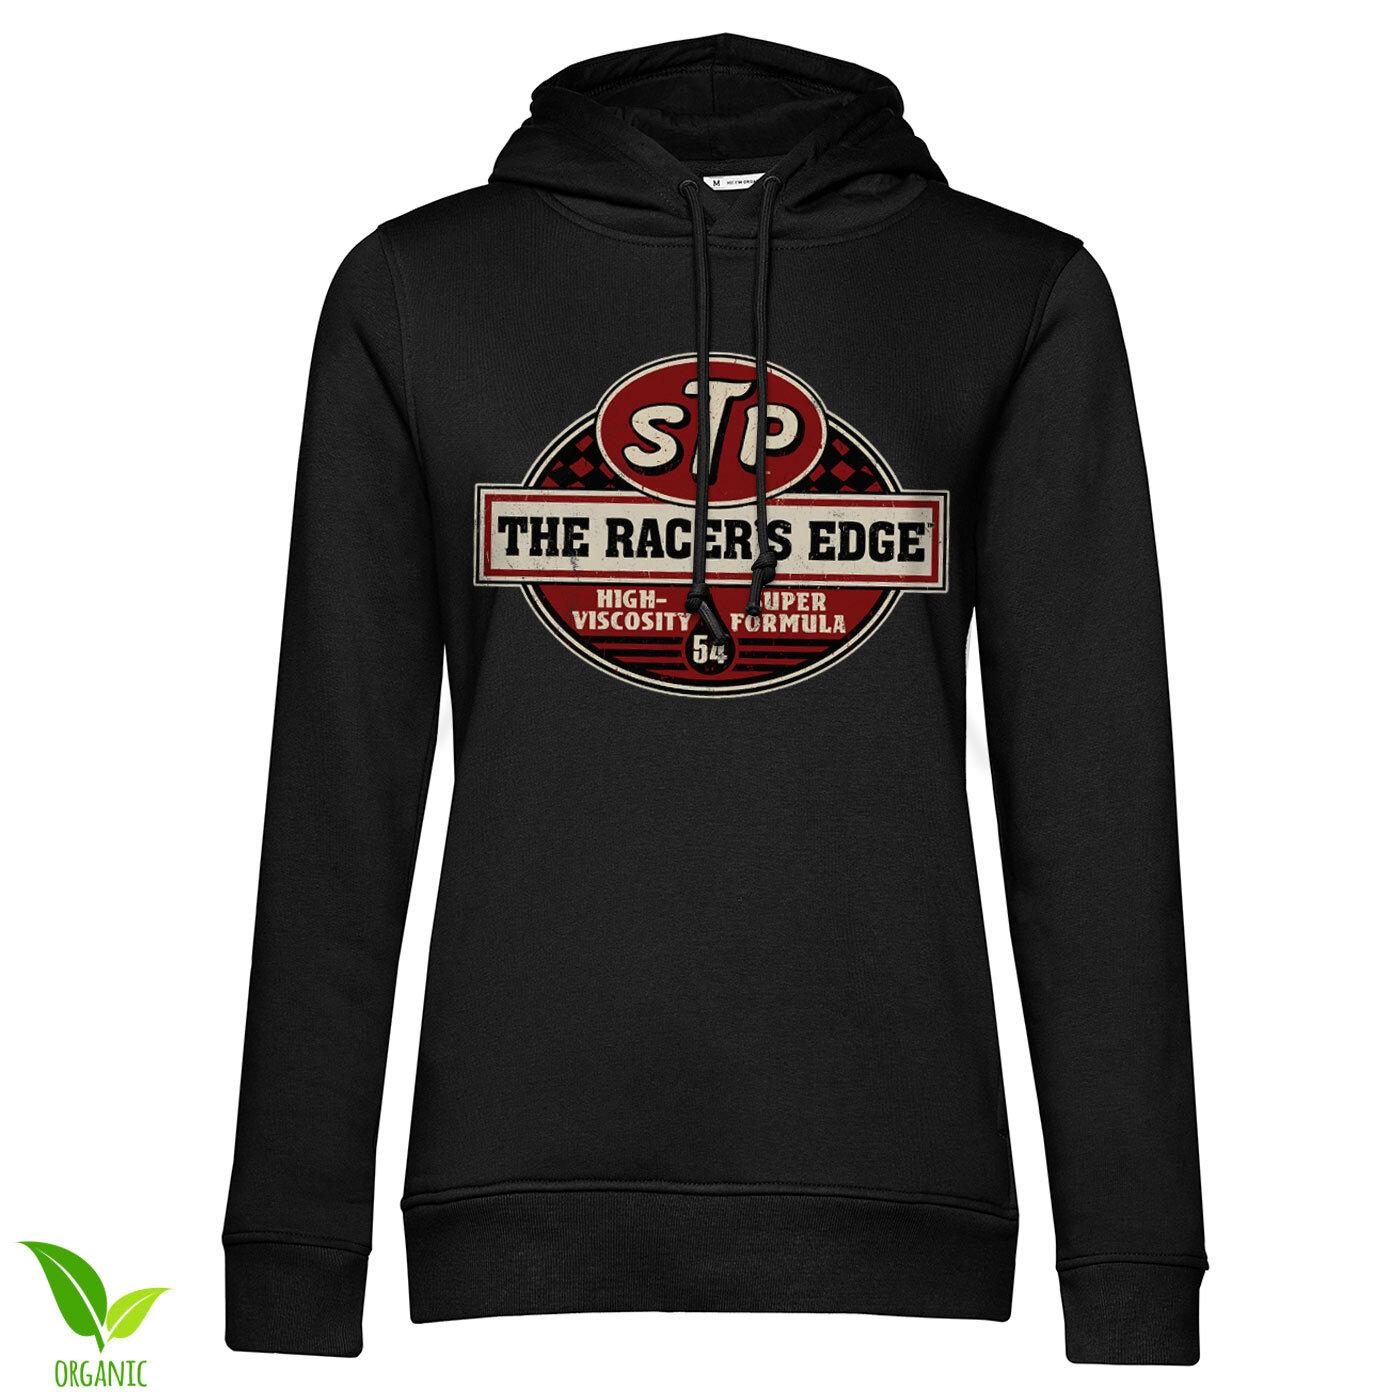 STP - Super Formula Girls Hoodie